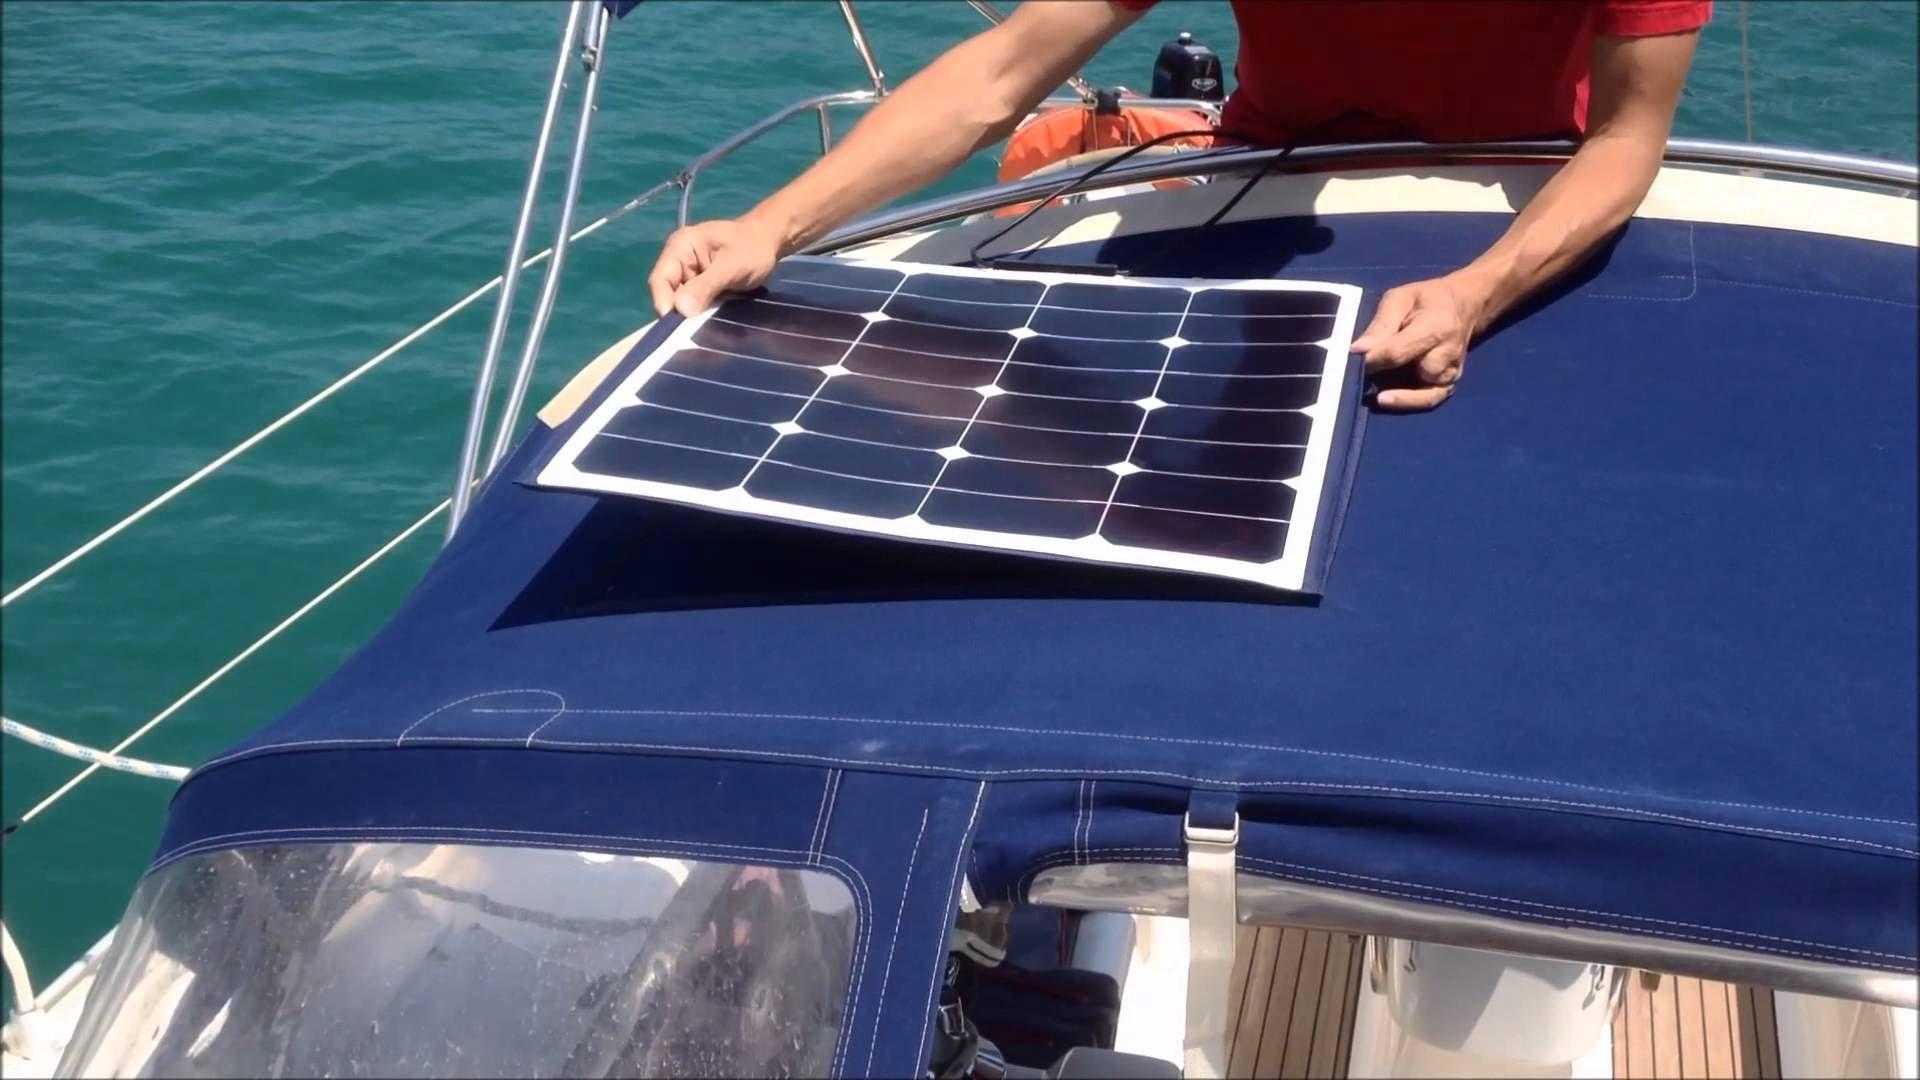 High Efficiency Lightweight Flexible Marine Solar Panels Mount With Zonnepanelen Huis Duurzaamheid